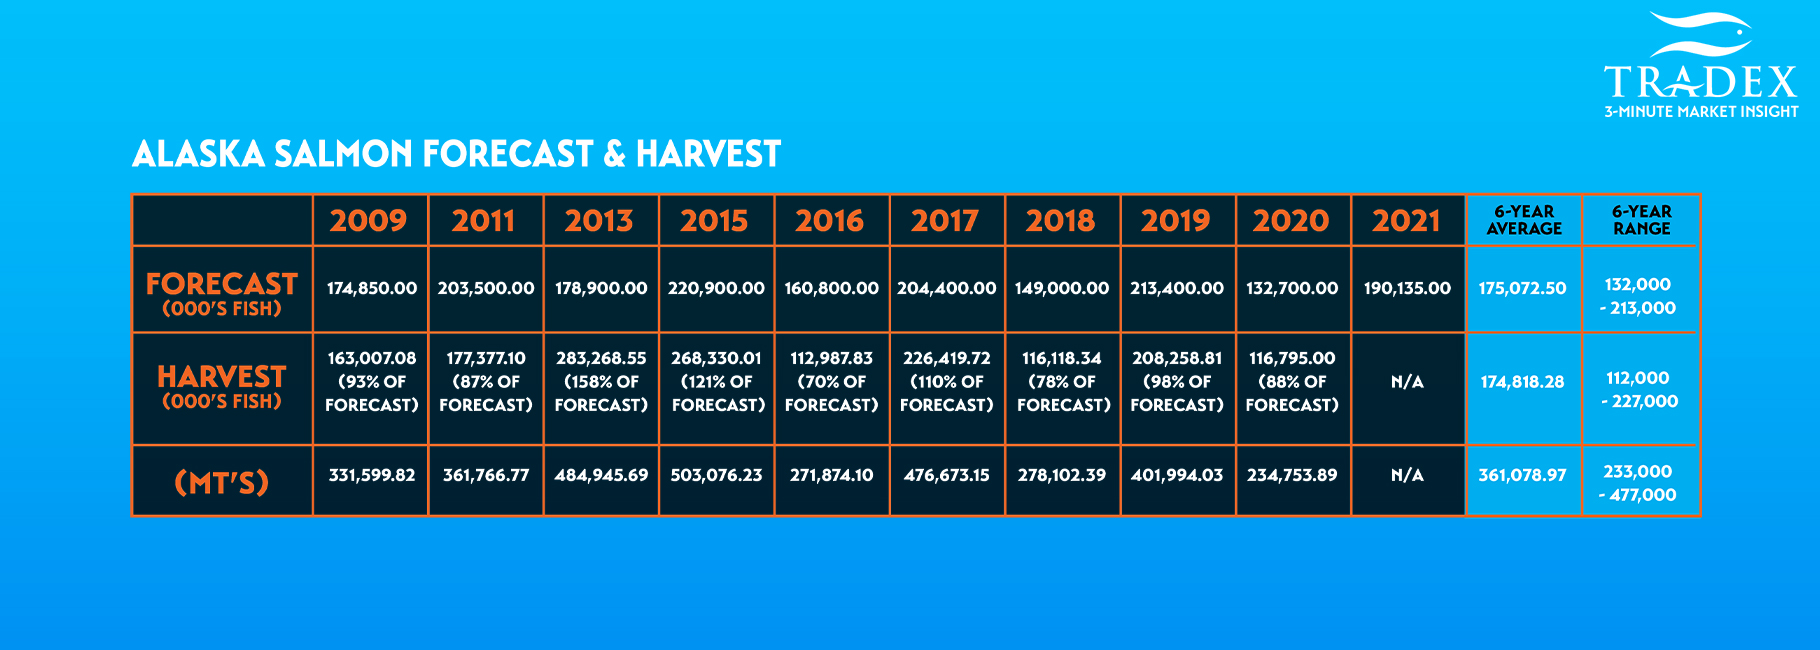 ALASKA Salmon Forecast & Harvest